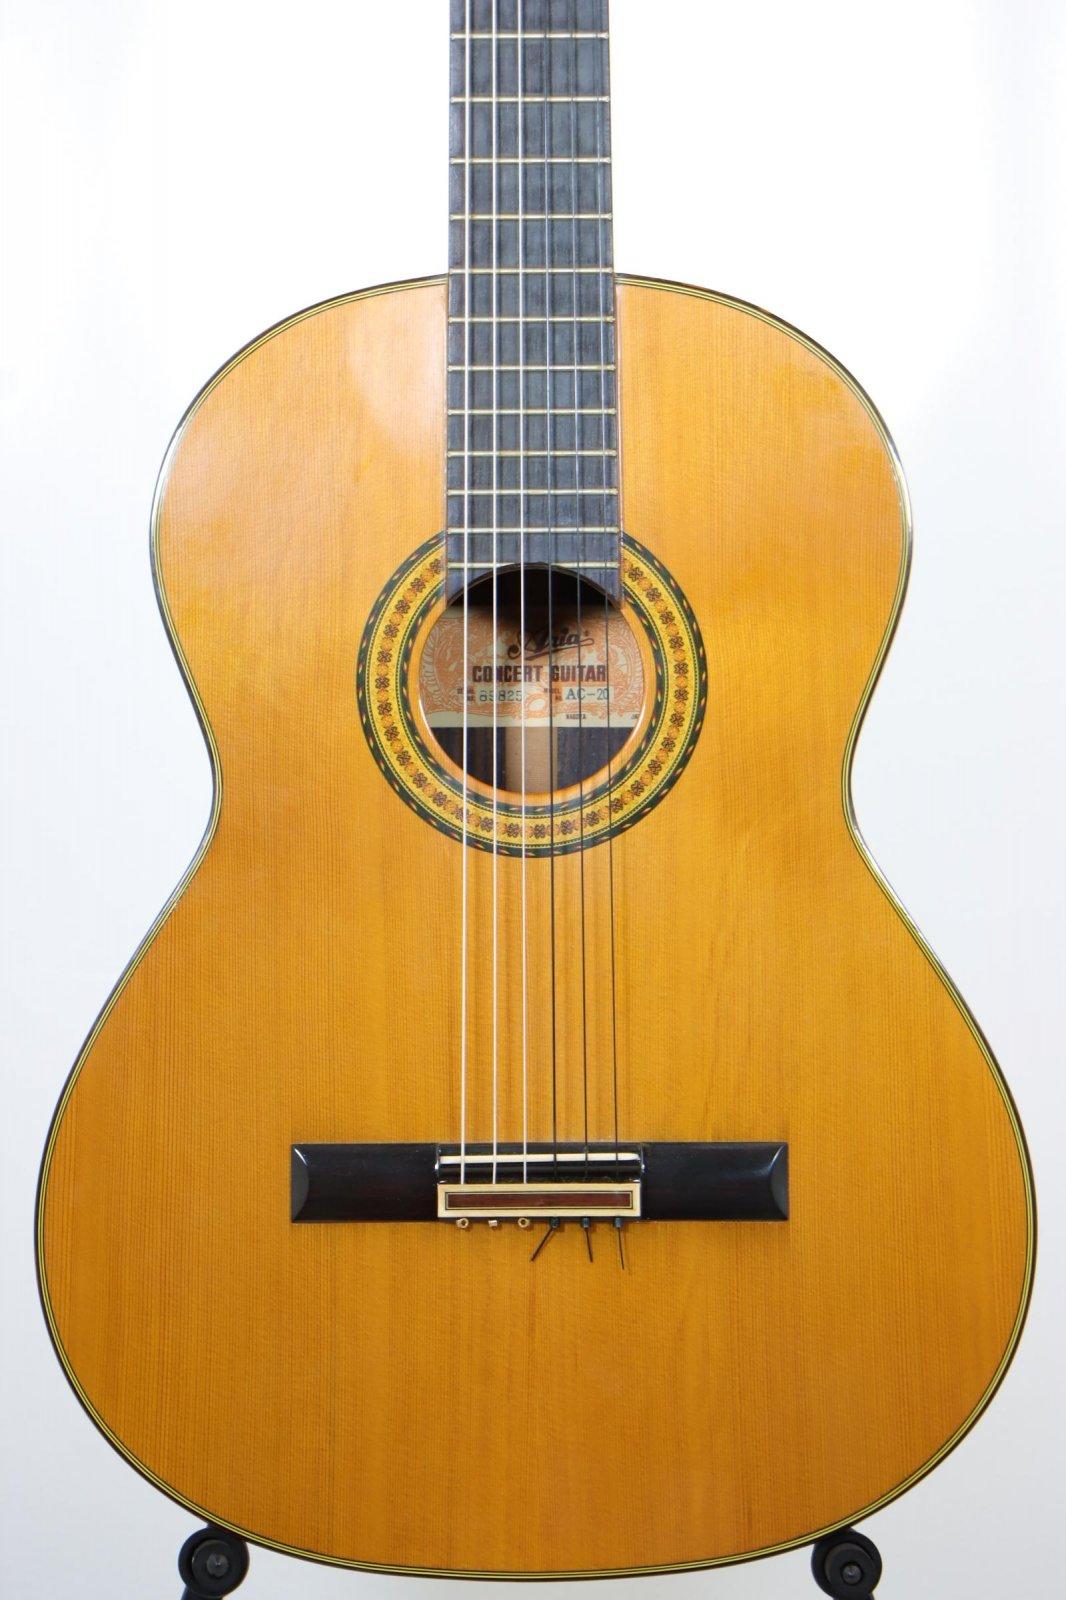 USED Aria AC-20 Classical Guitar w/Solid Cedar Top